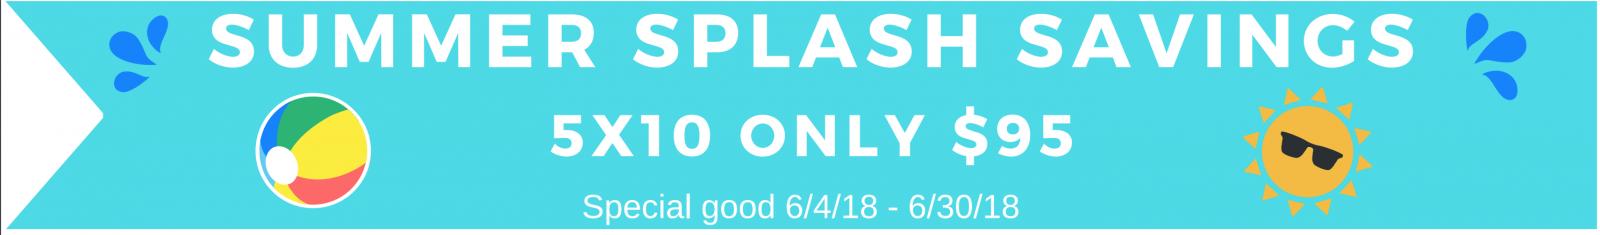 Summer Splash Savings 5x10 only $95